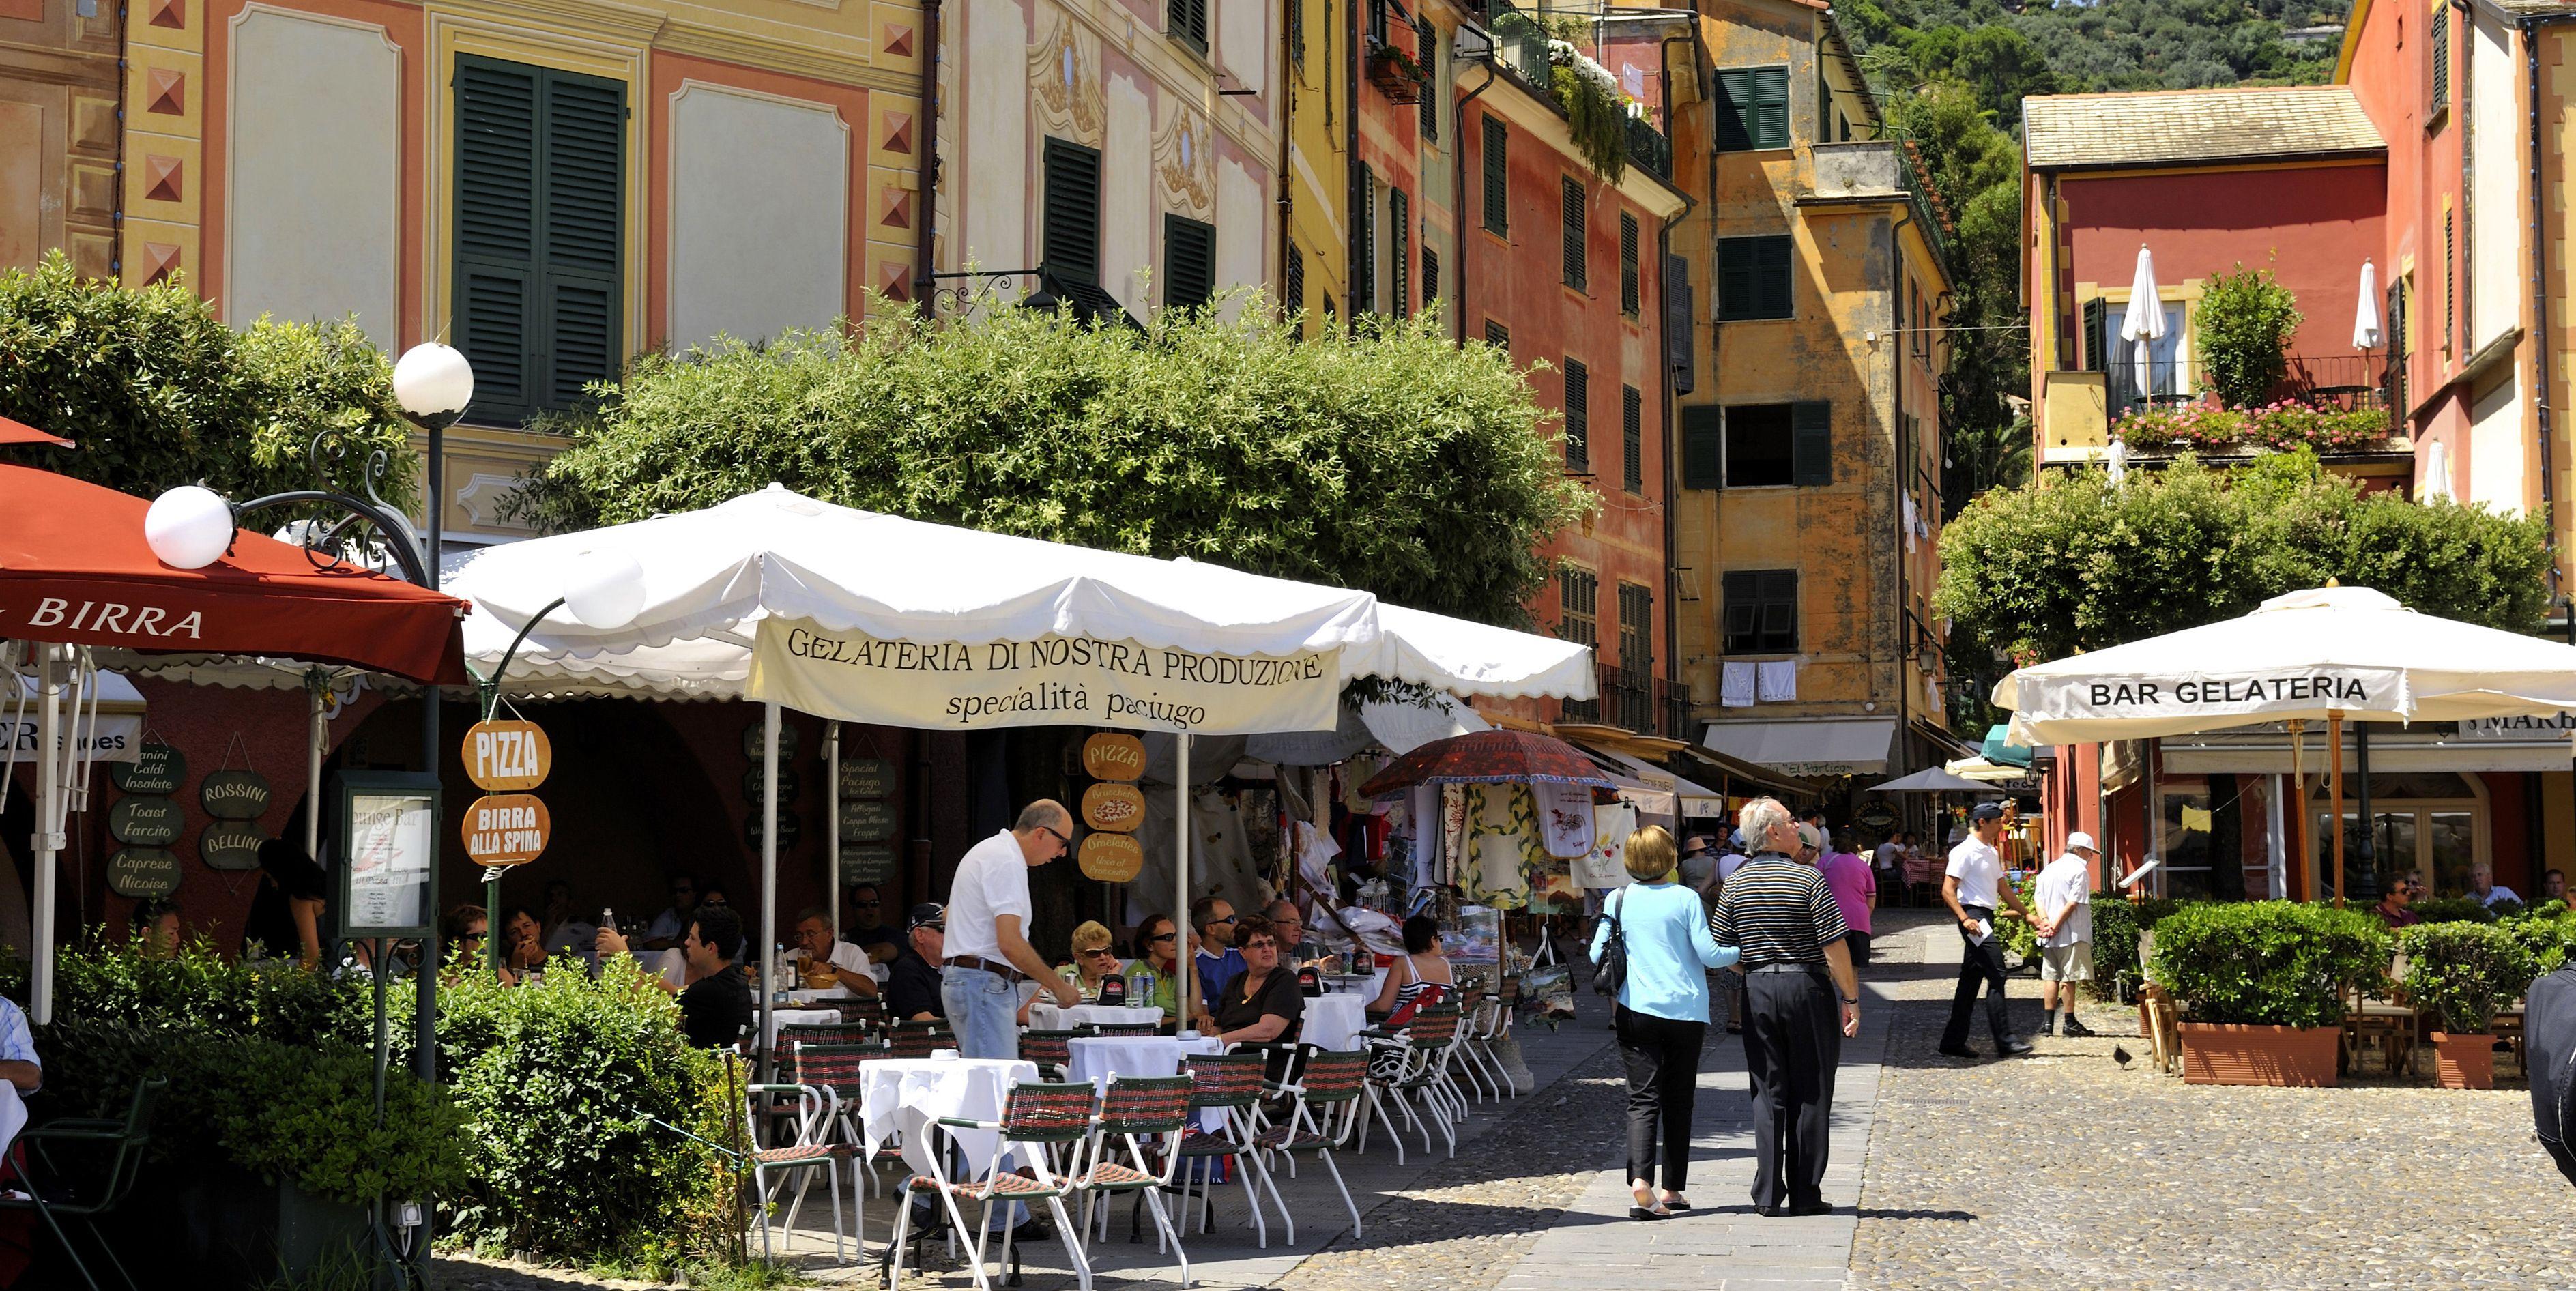 Italy, Liguria, Riviera ligure, Portofino, one of the most exclusive resorts in Italy